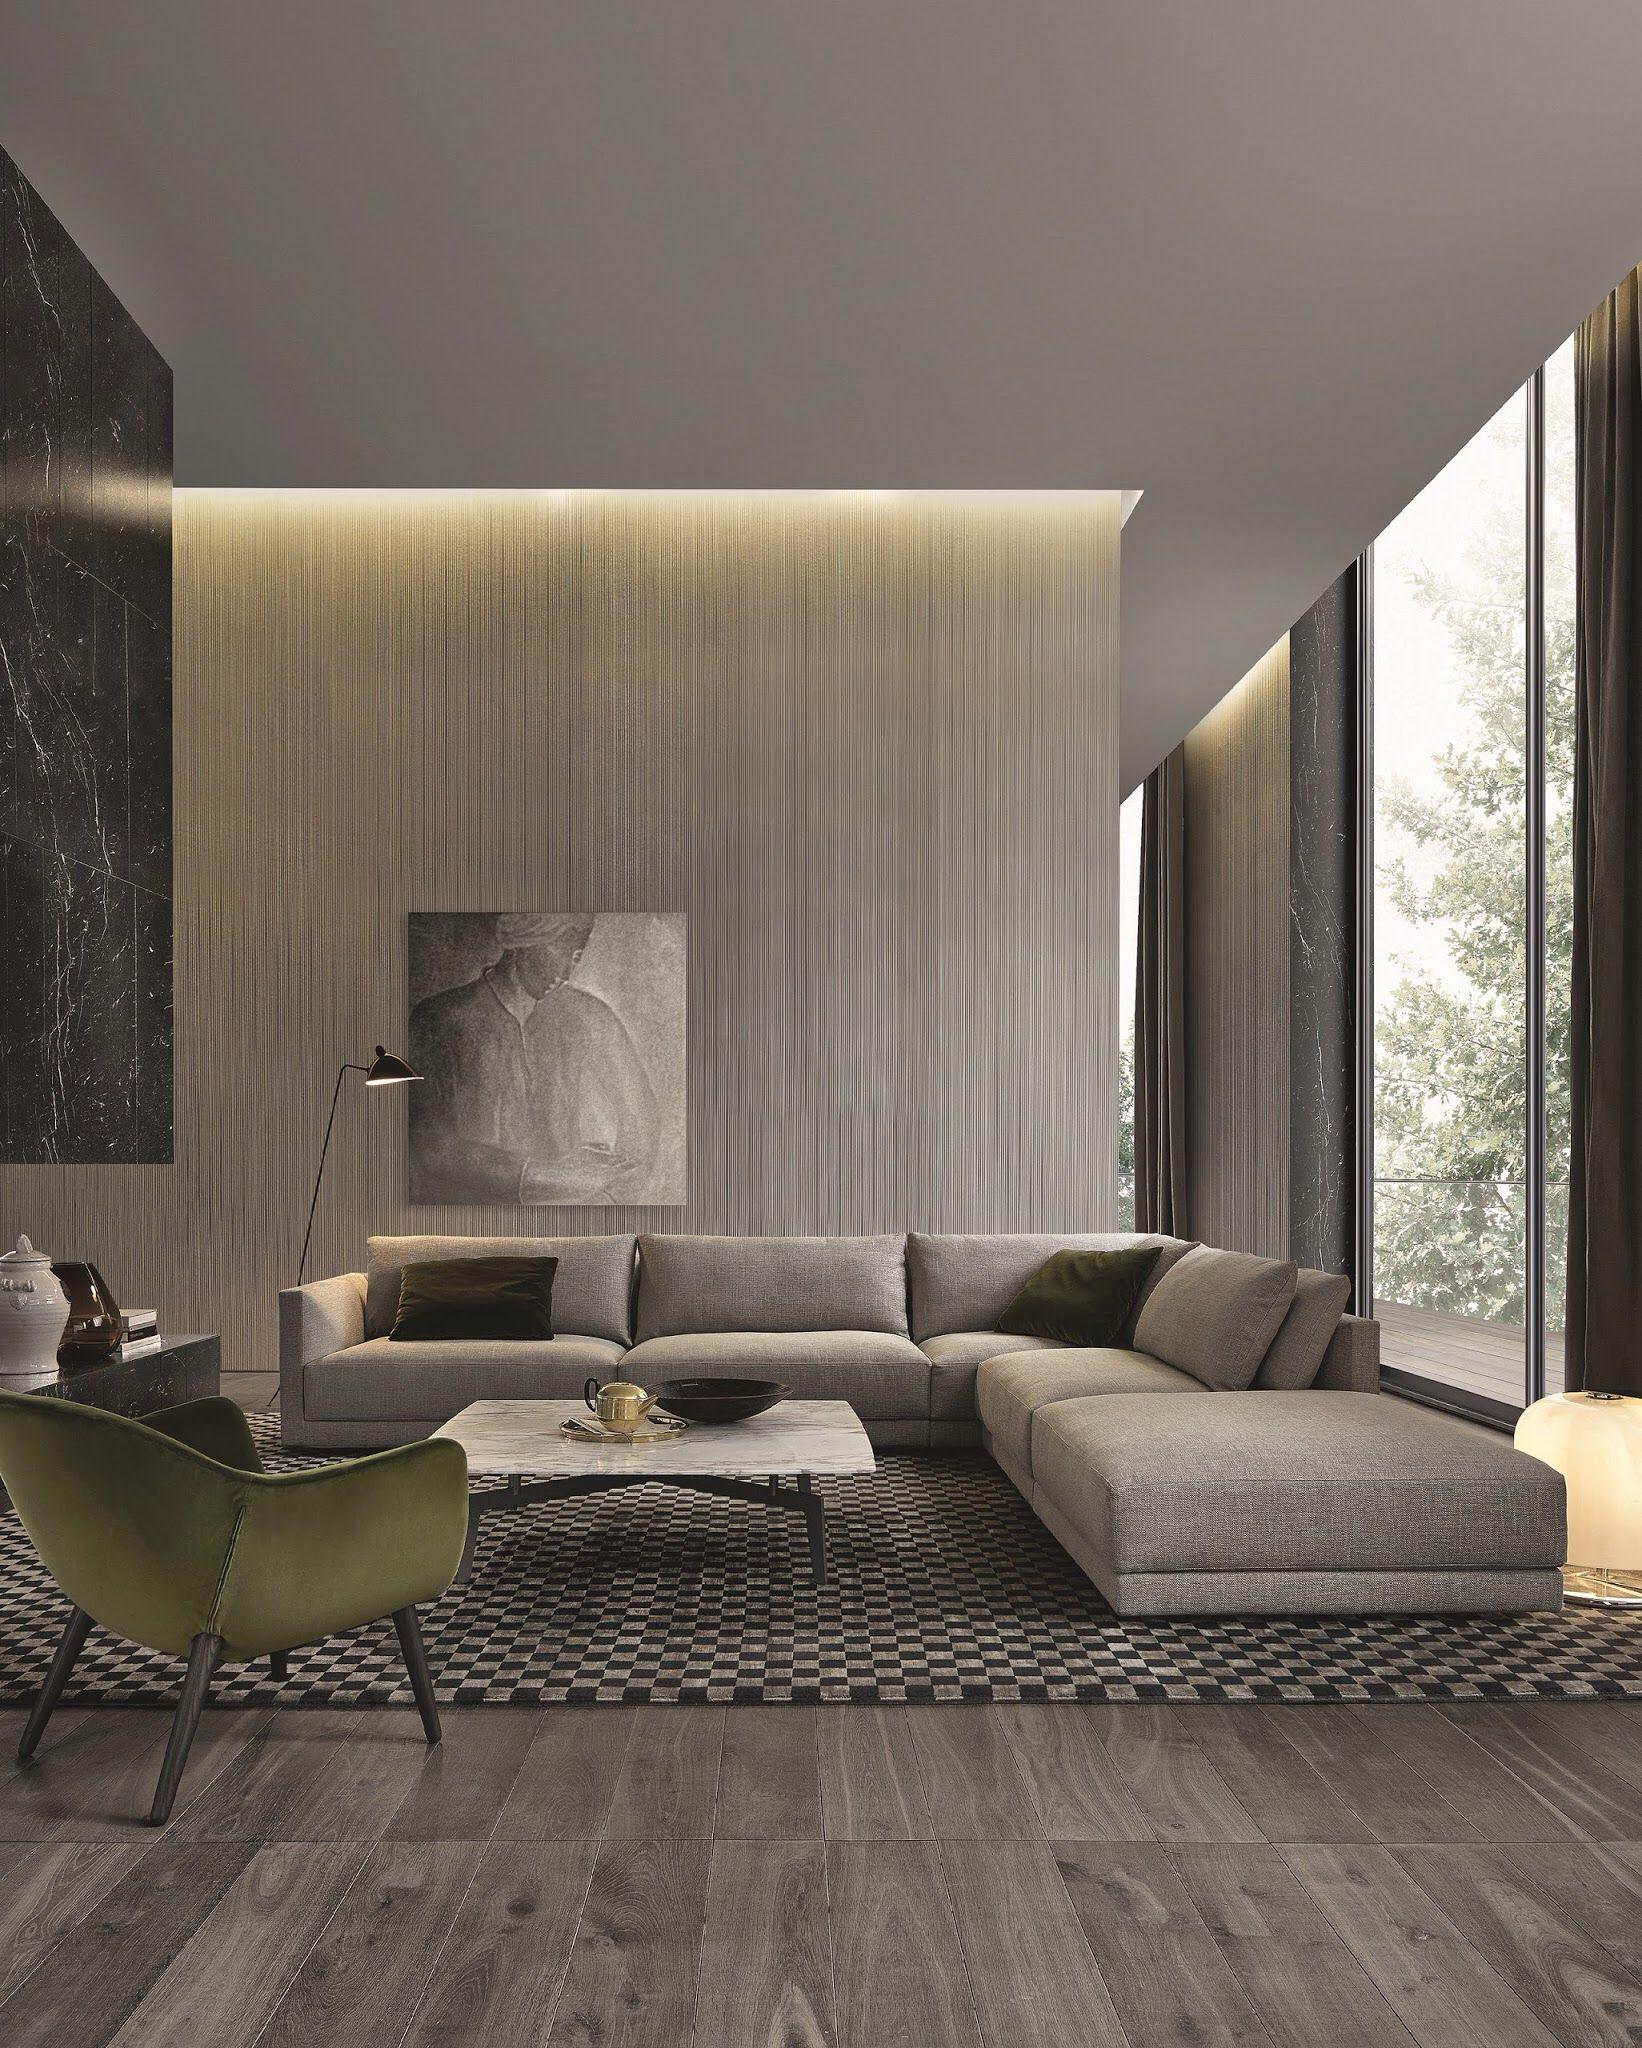 L Shaped Single Storey Homes Interior Design I J C Mobile: Jean Marie Massaud For Poliform